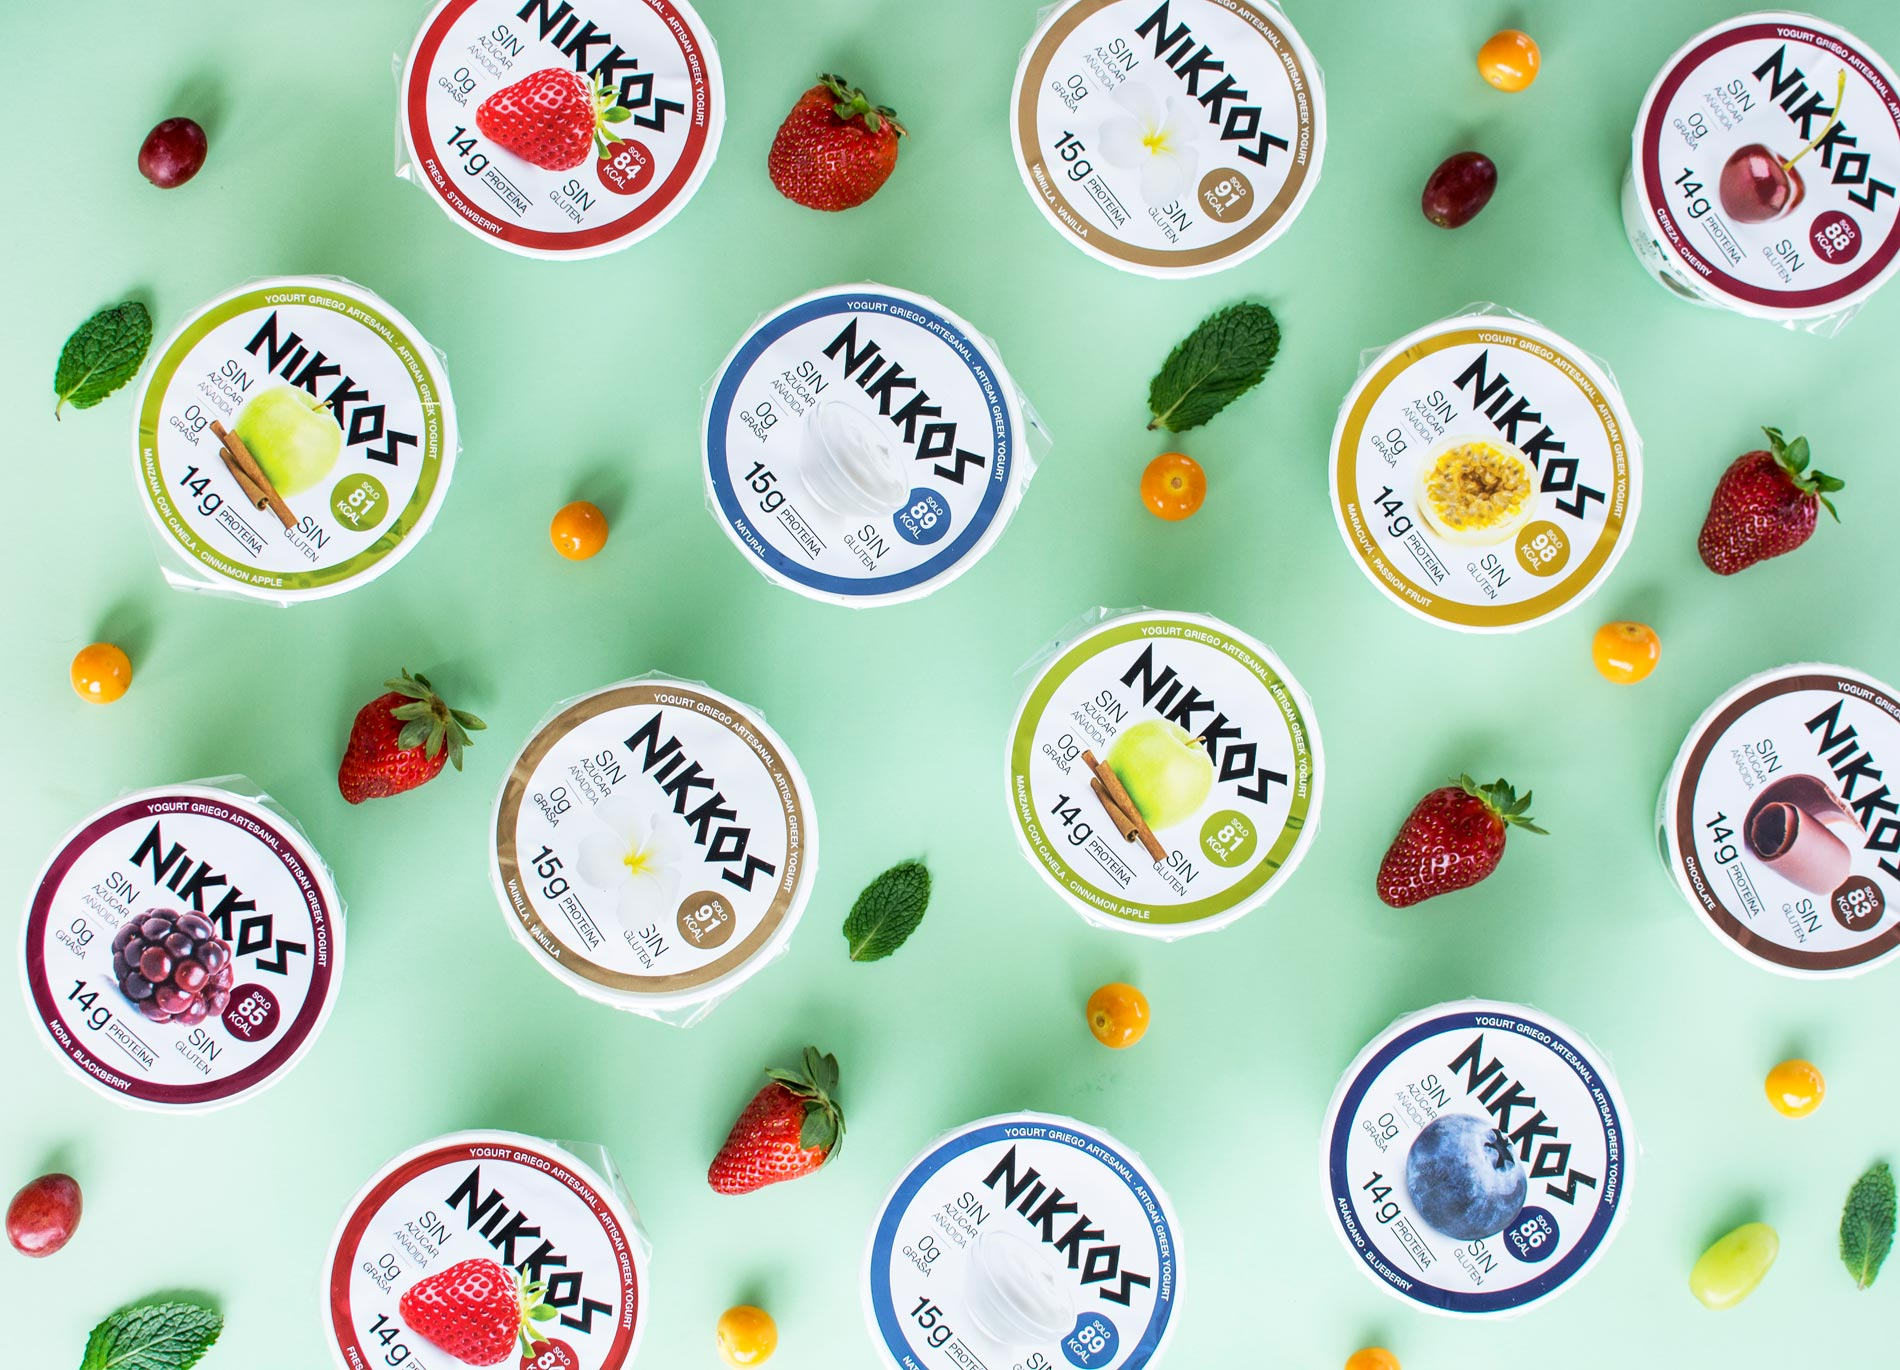 Yogurt Griego Artesanal